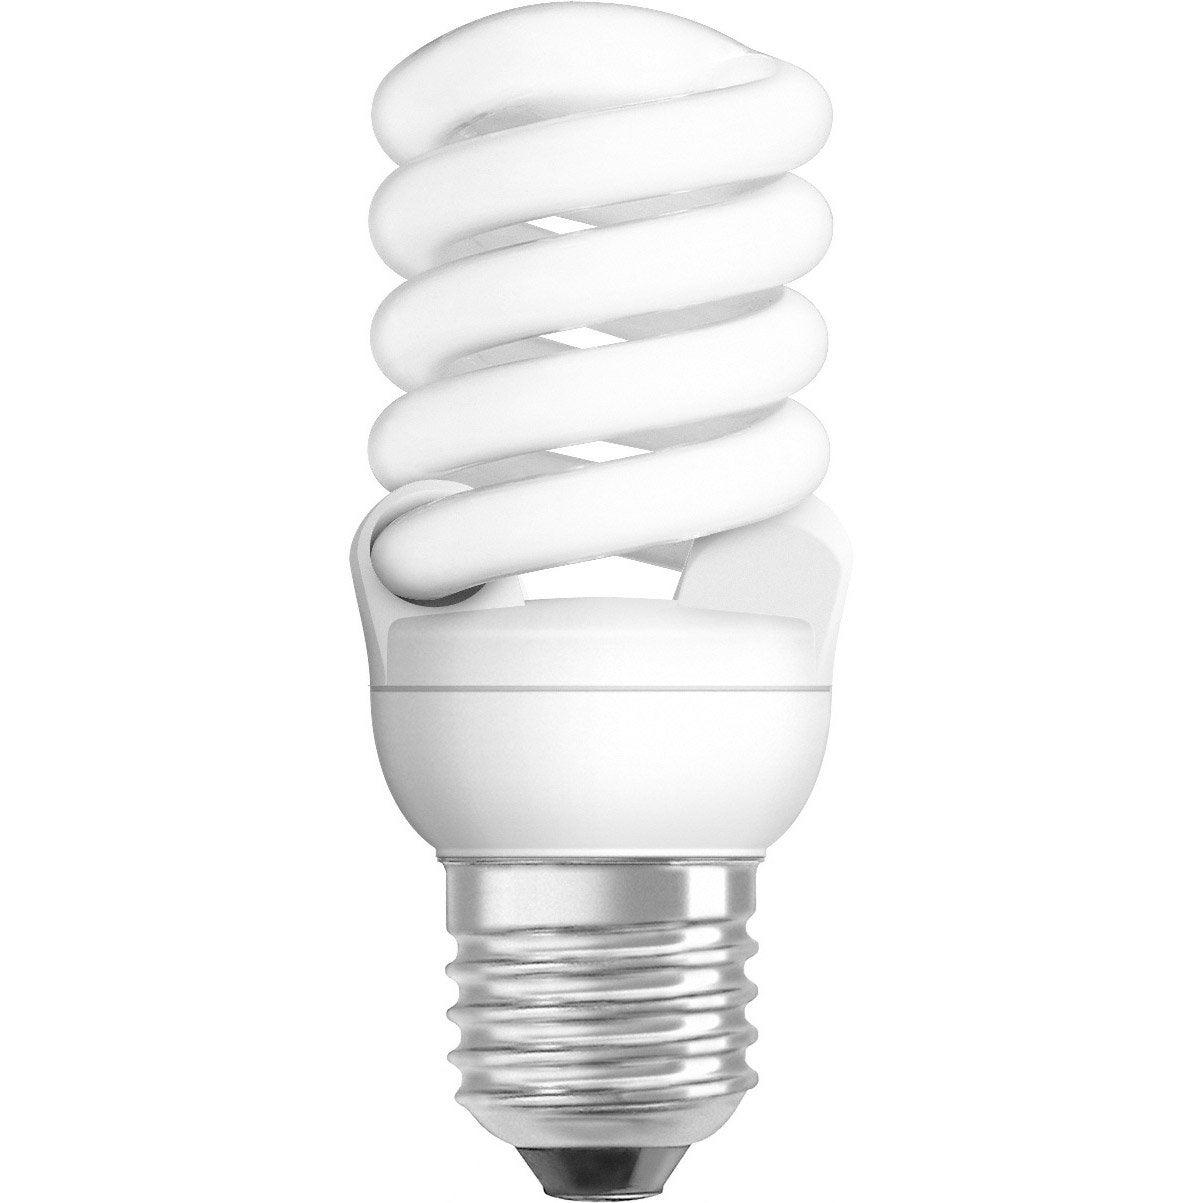 ampoule spirale conomie d 39 nergie 14w osram e27 lumi re. Black Bedroom Furniture Sets. Home Design Ideas